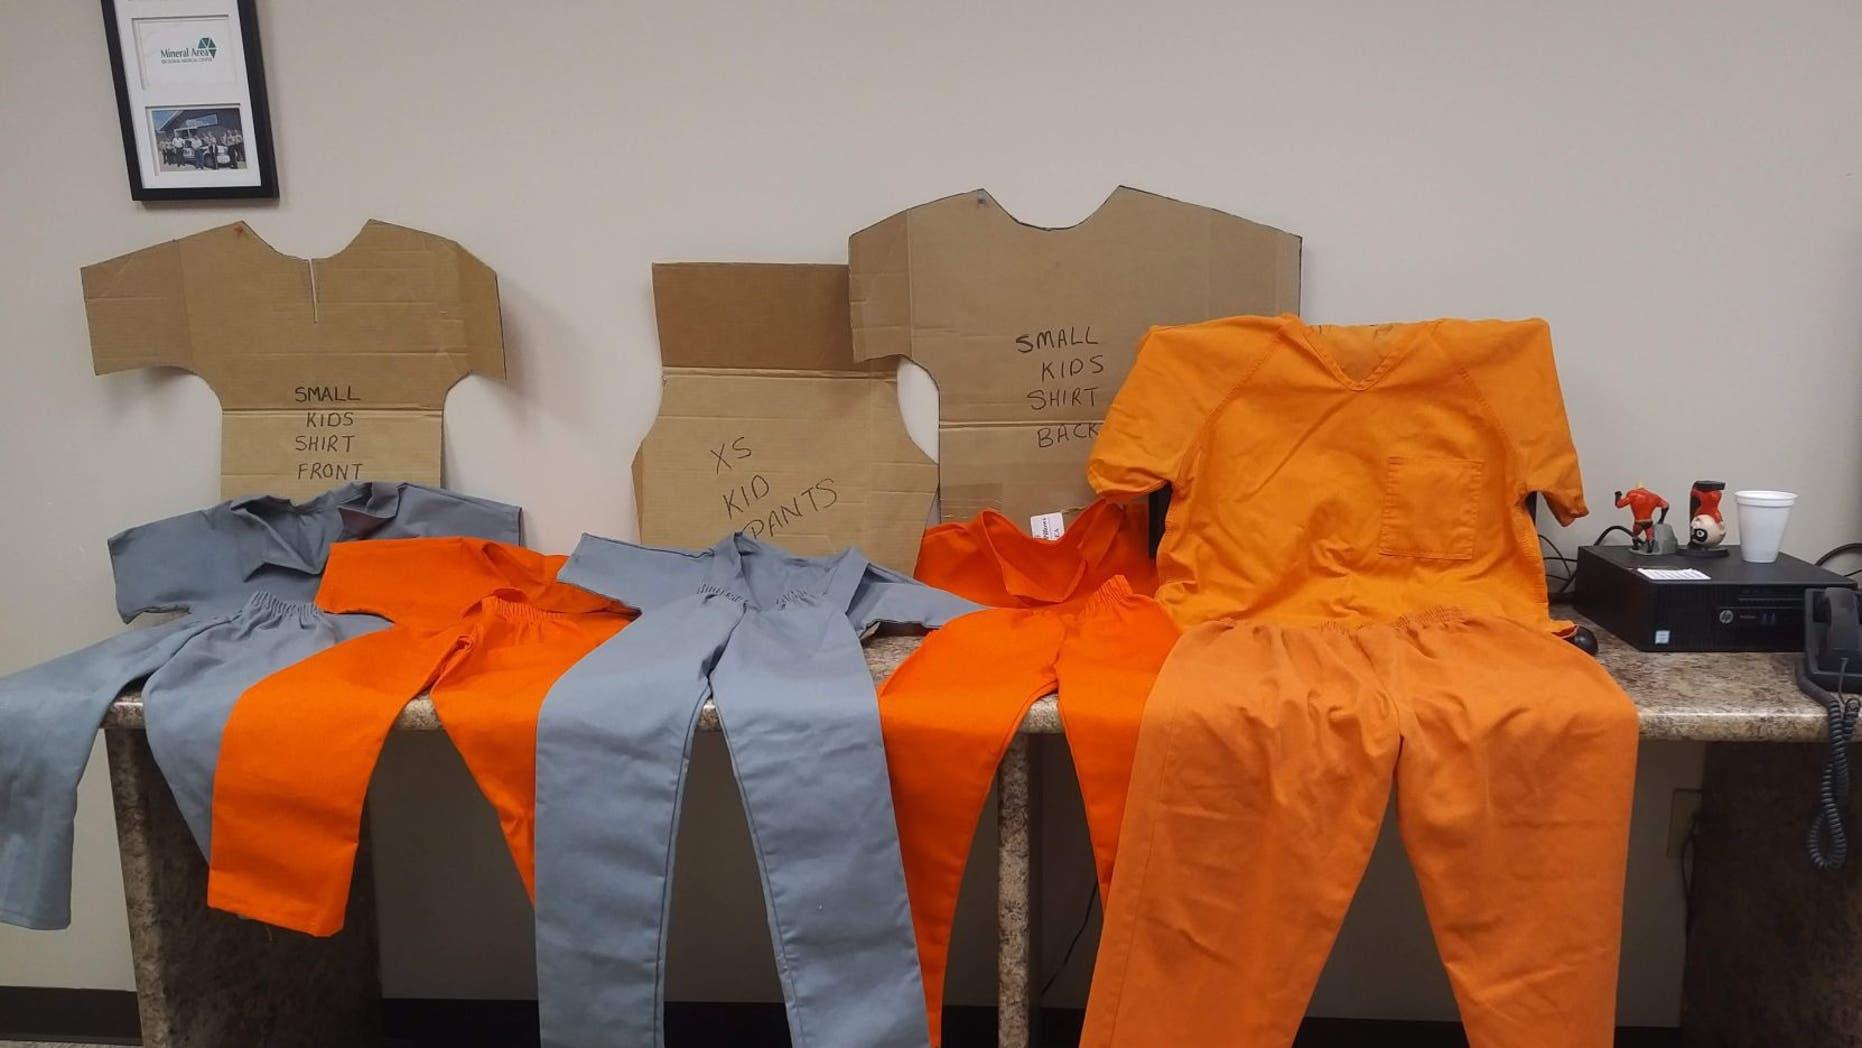 Kid-sized prisoner uniforms ordered by Missouri woman